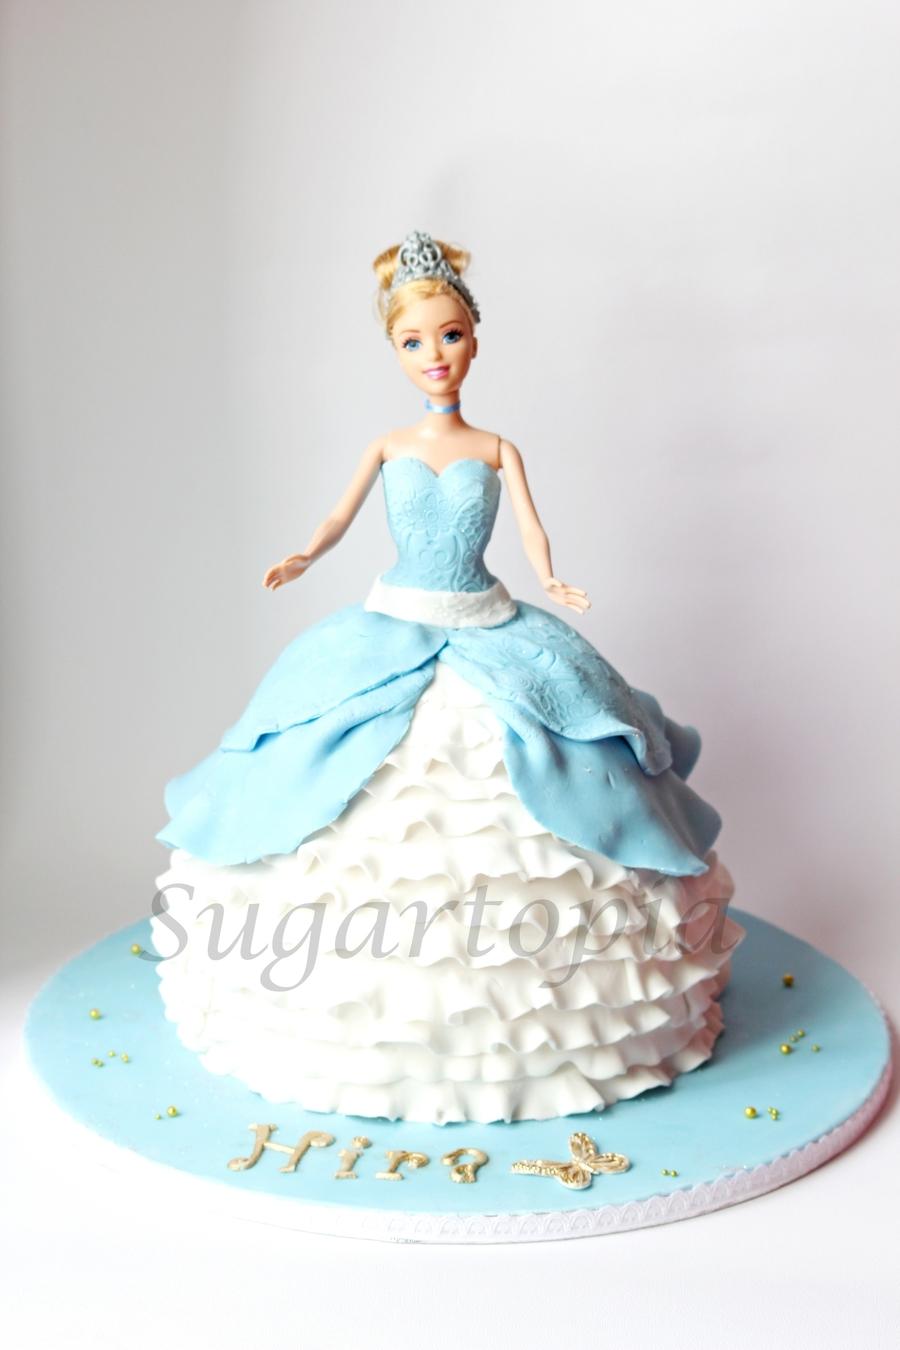 Decoration Of Doll Cake : Cinderella Doll Cake - CakeCentral.com